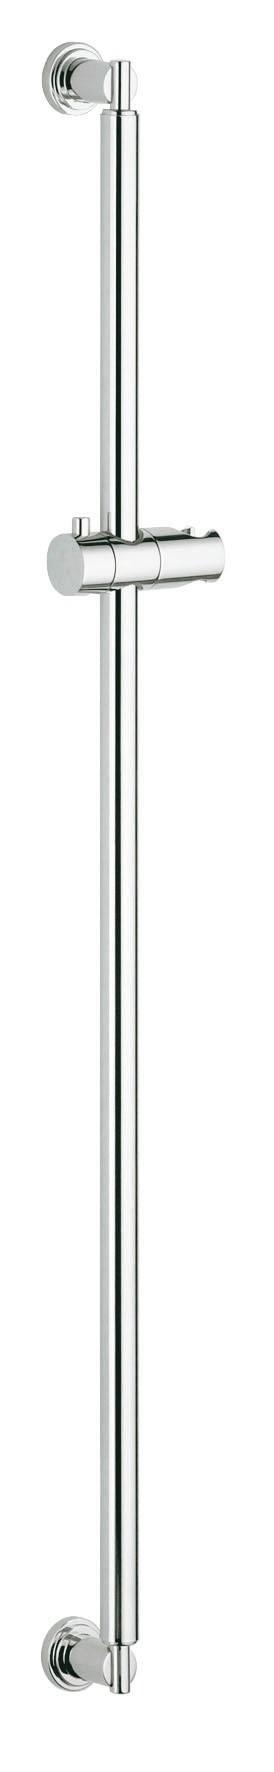 Душевой кронштейн Grohe 28346000 Sena 900 мм, хром